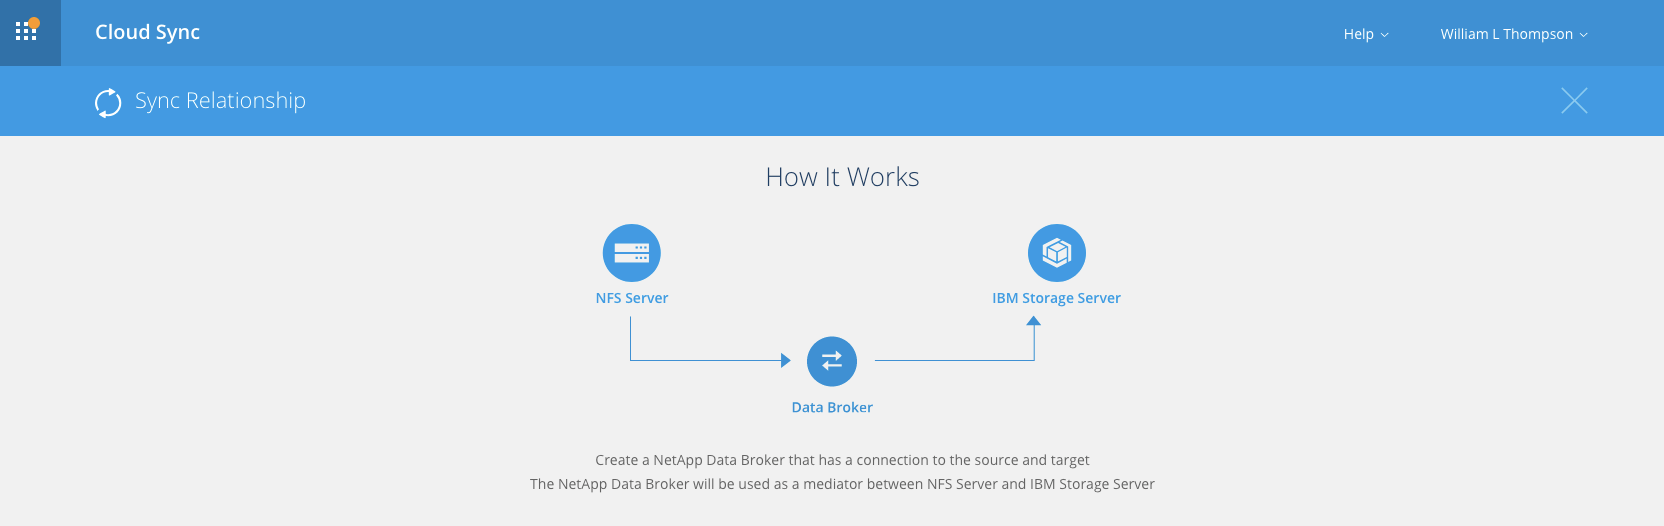 How do I use NetApp Cloud Sync with Wasabi? – Wasabi Knowledge Base